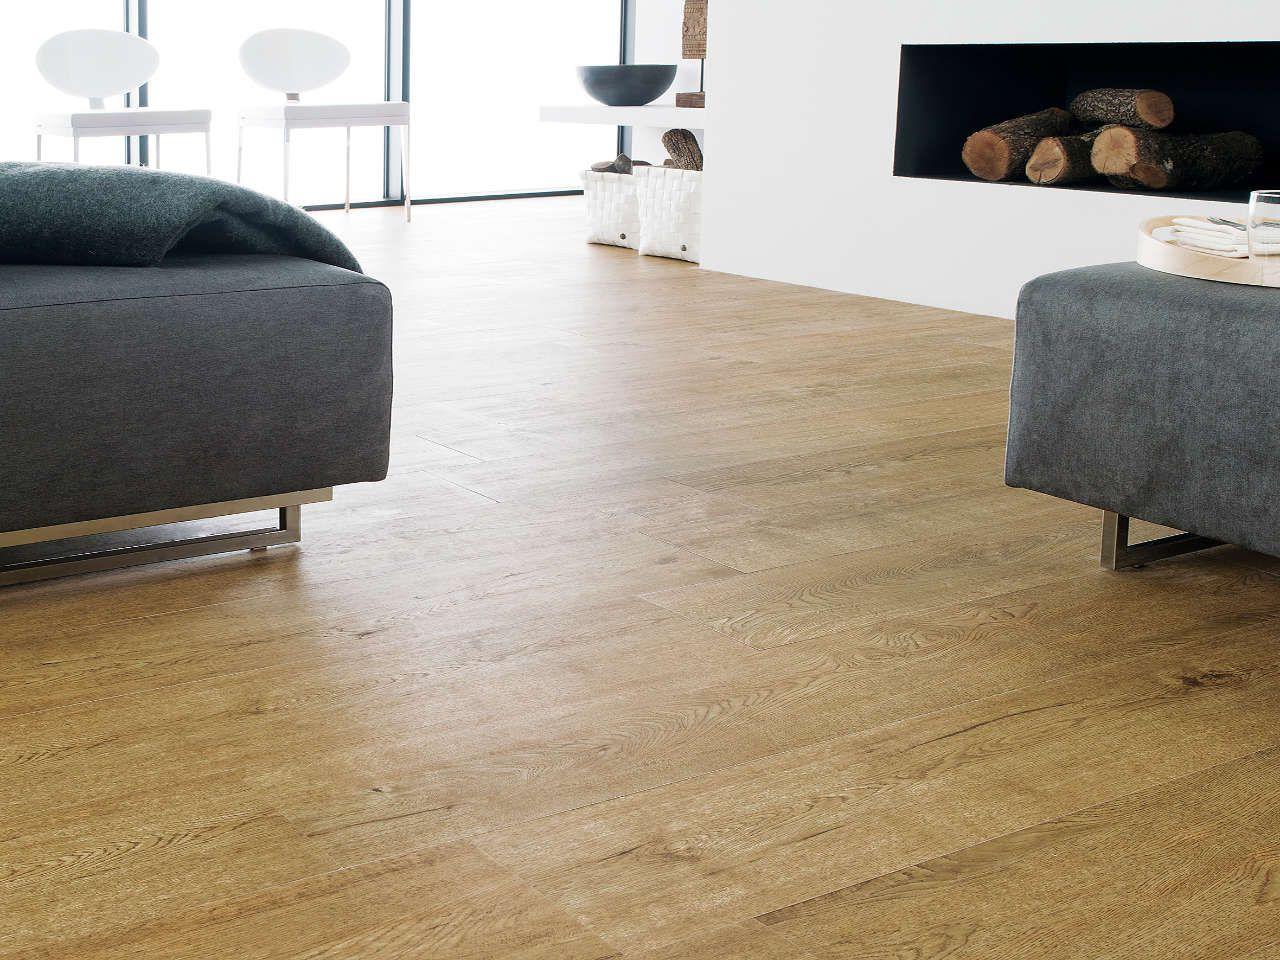 Pin by albert sabin viana on detalhes wood effect tiles - Suelos imitacion parquet ...